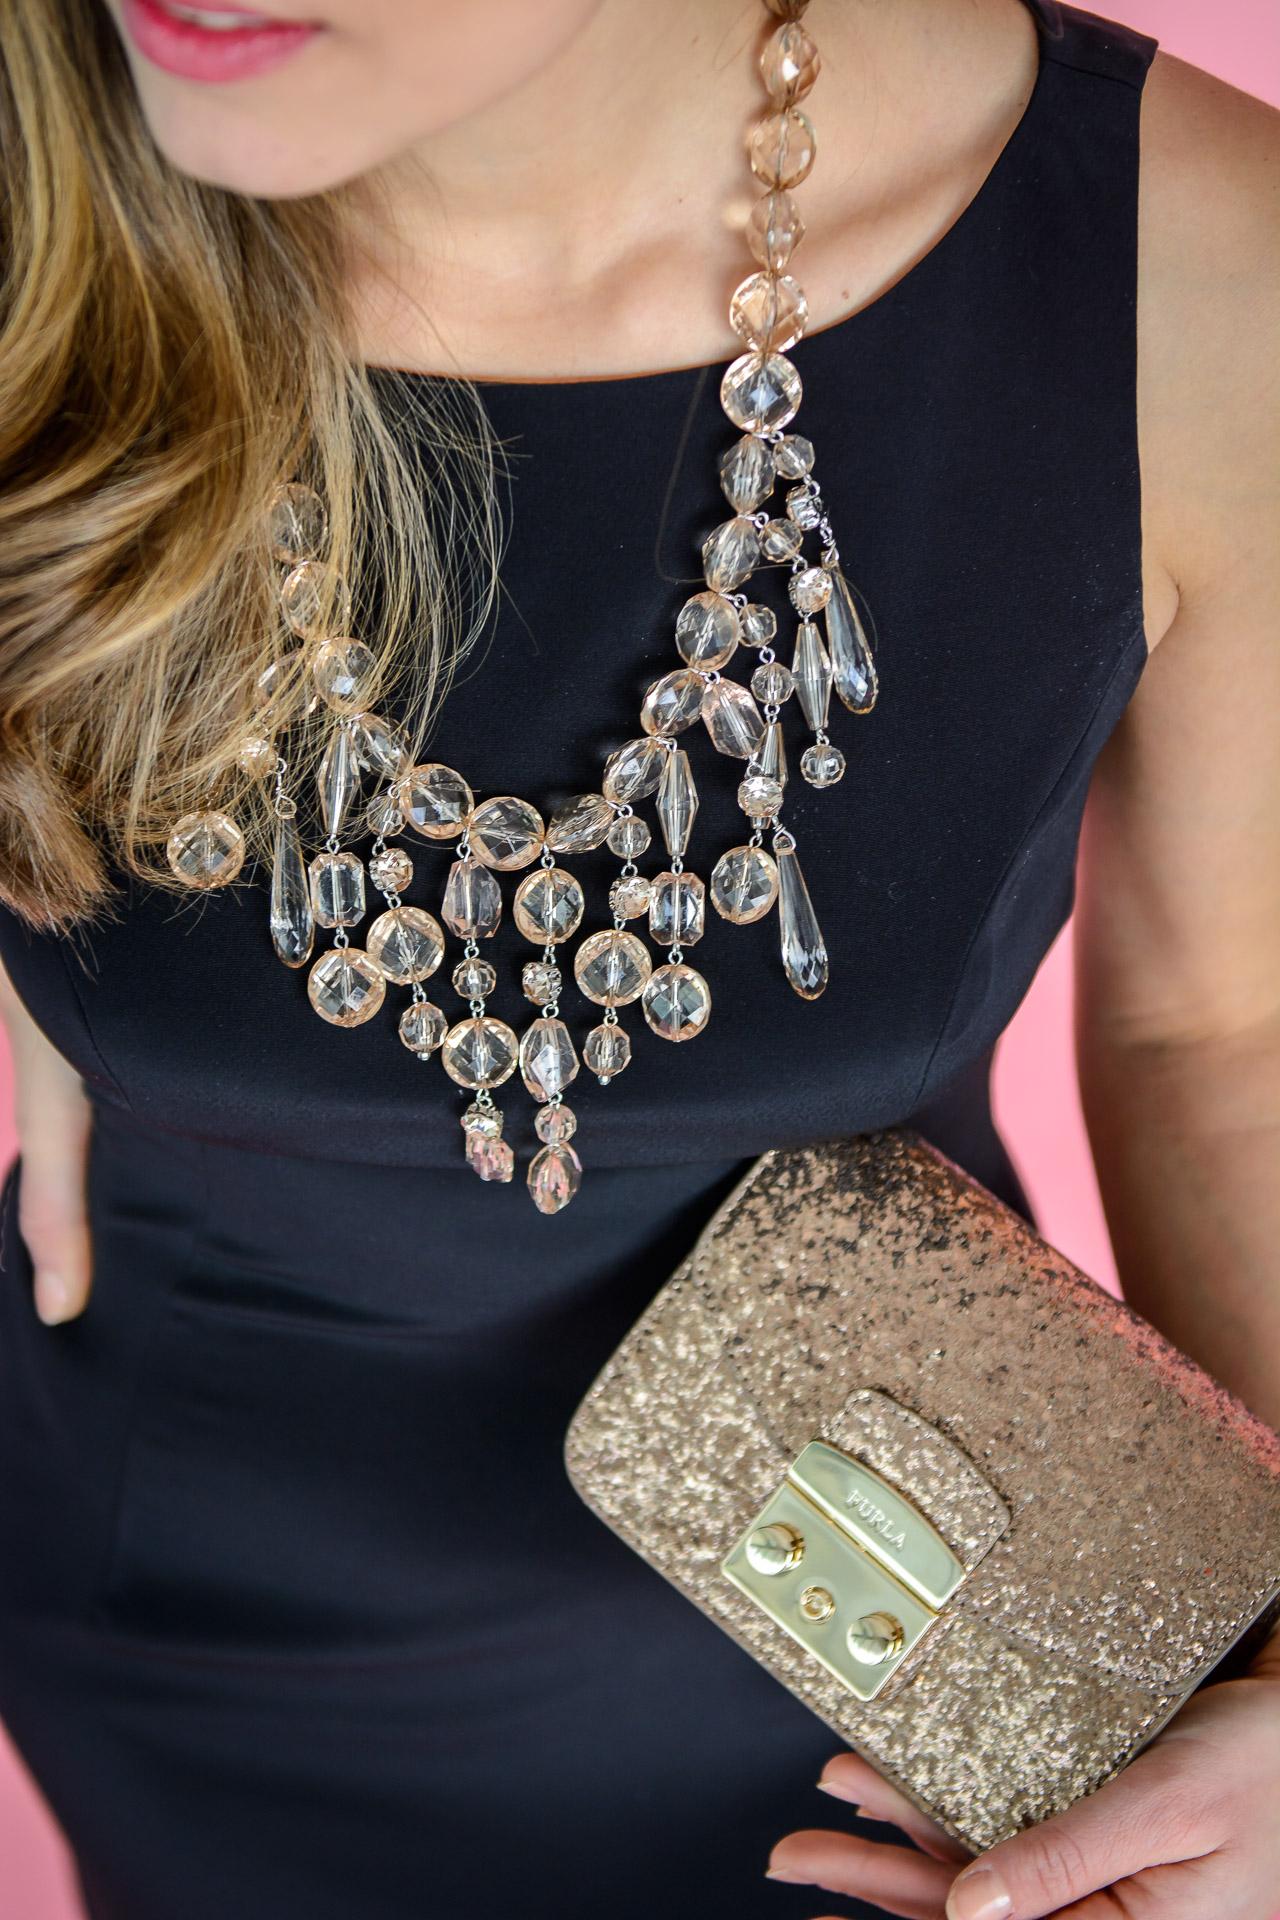 Accessorie furla handbag